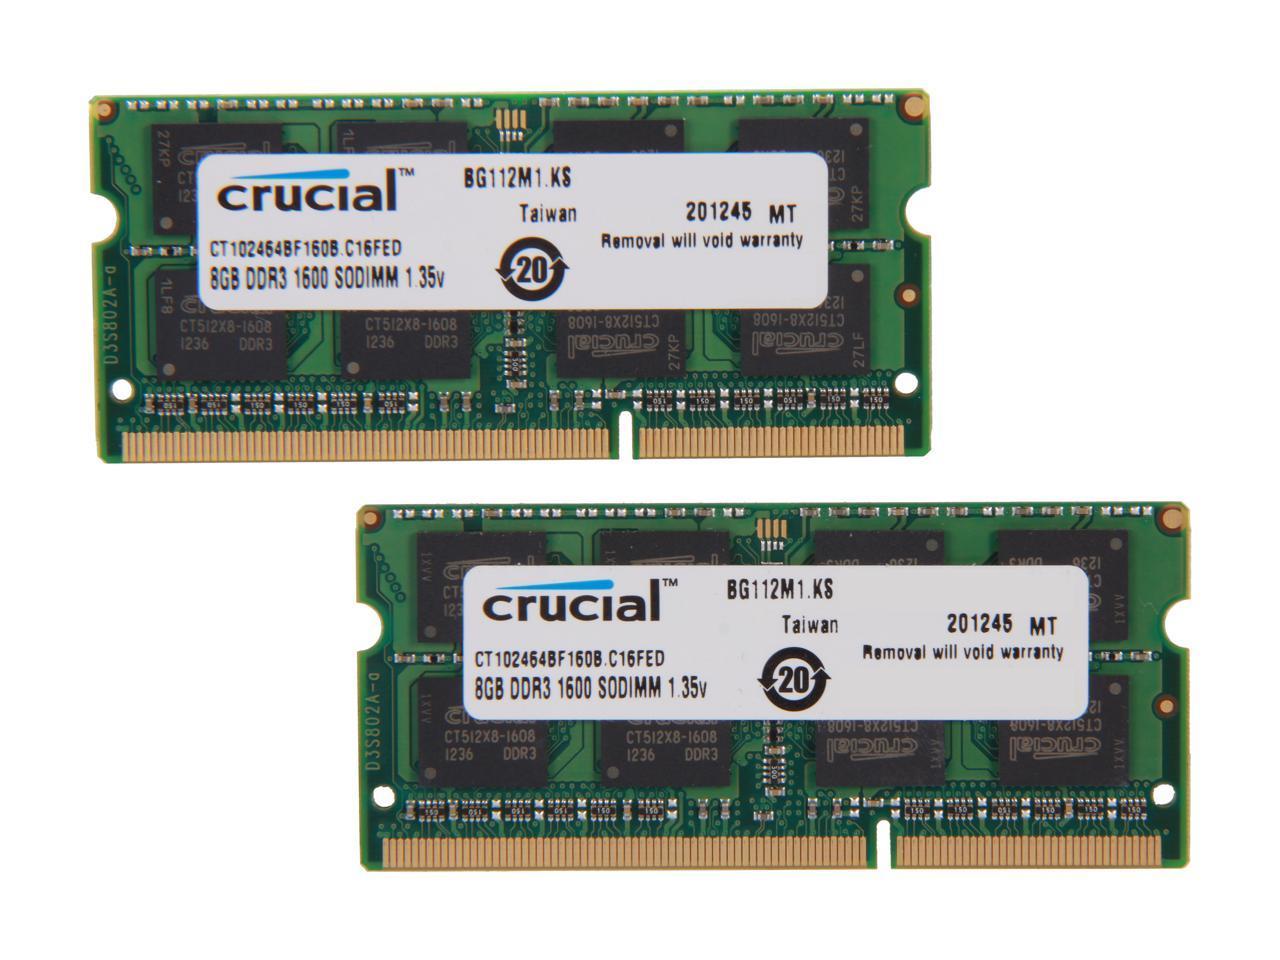 2 x 8GB | DDR3 1600MHz SODIMM PC3-12800 204-Pin Non-ECC Memory Upgrade Kit A-Tech 16GB RAM for DELL INSPIRON 17R 3737